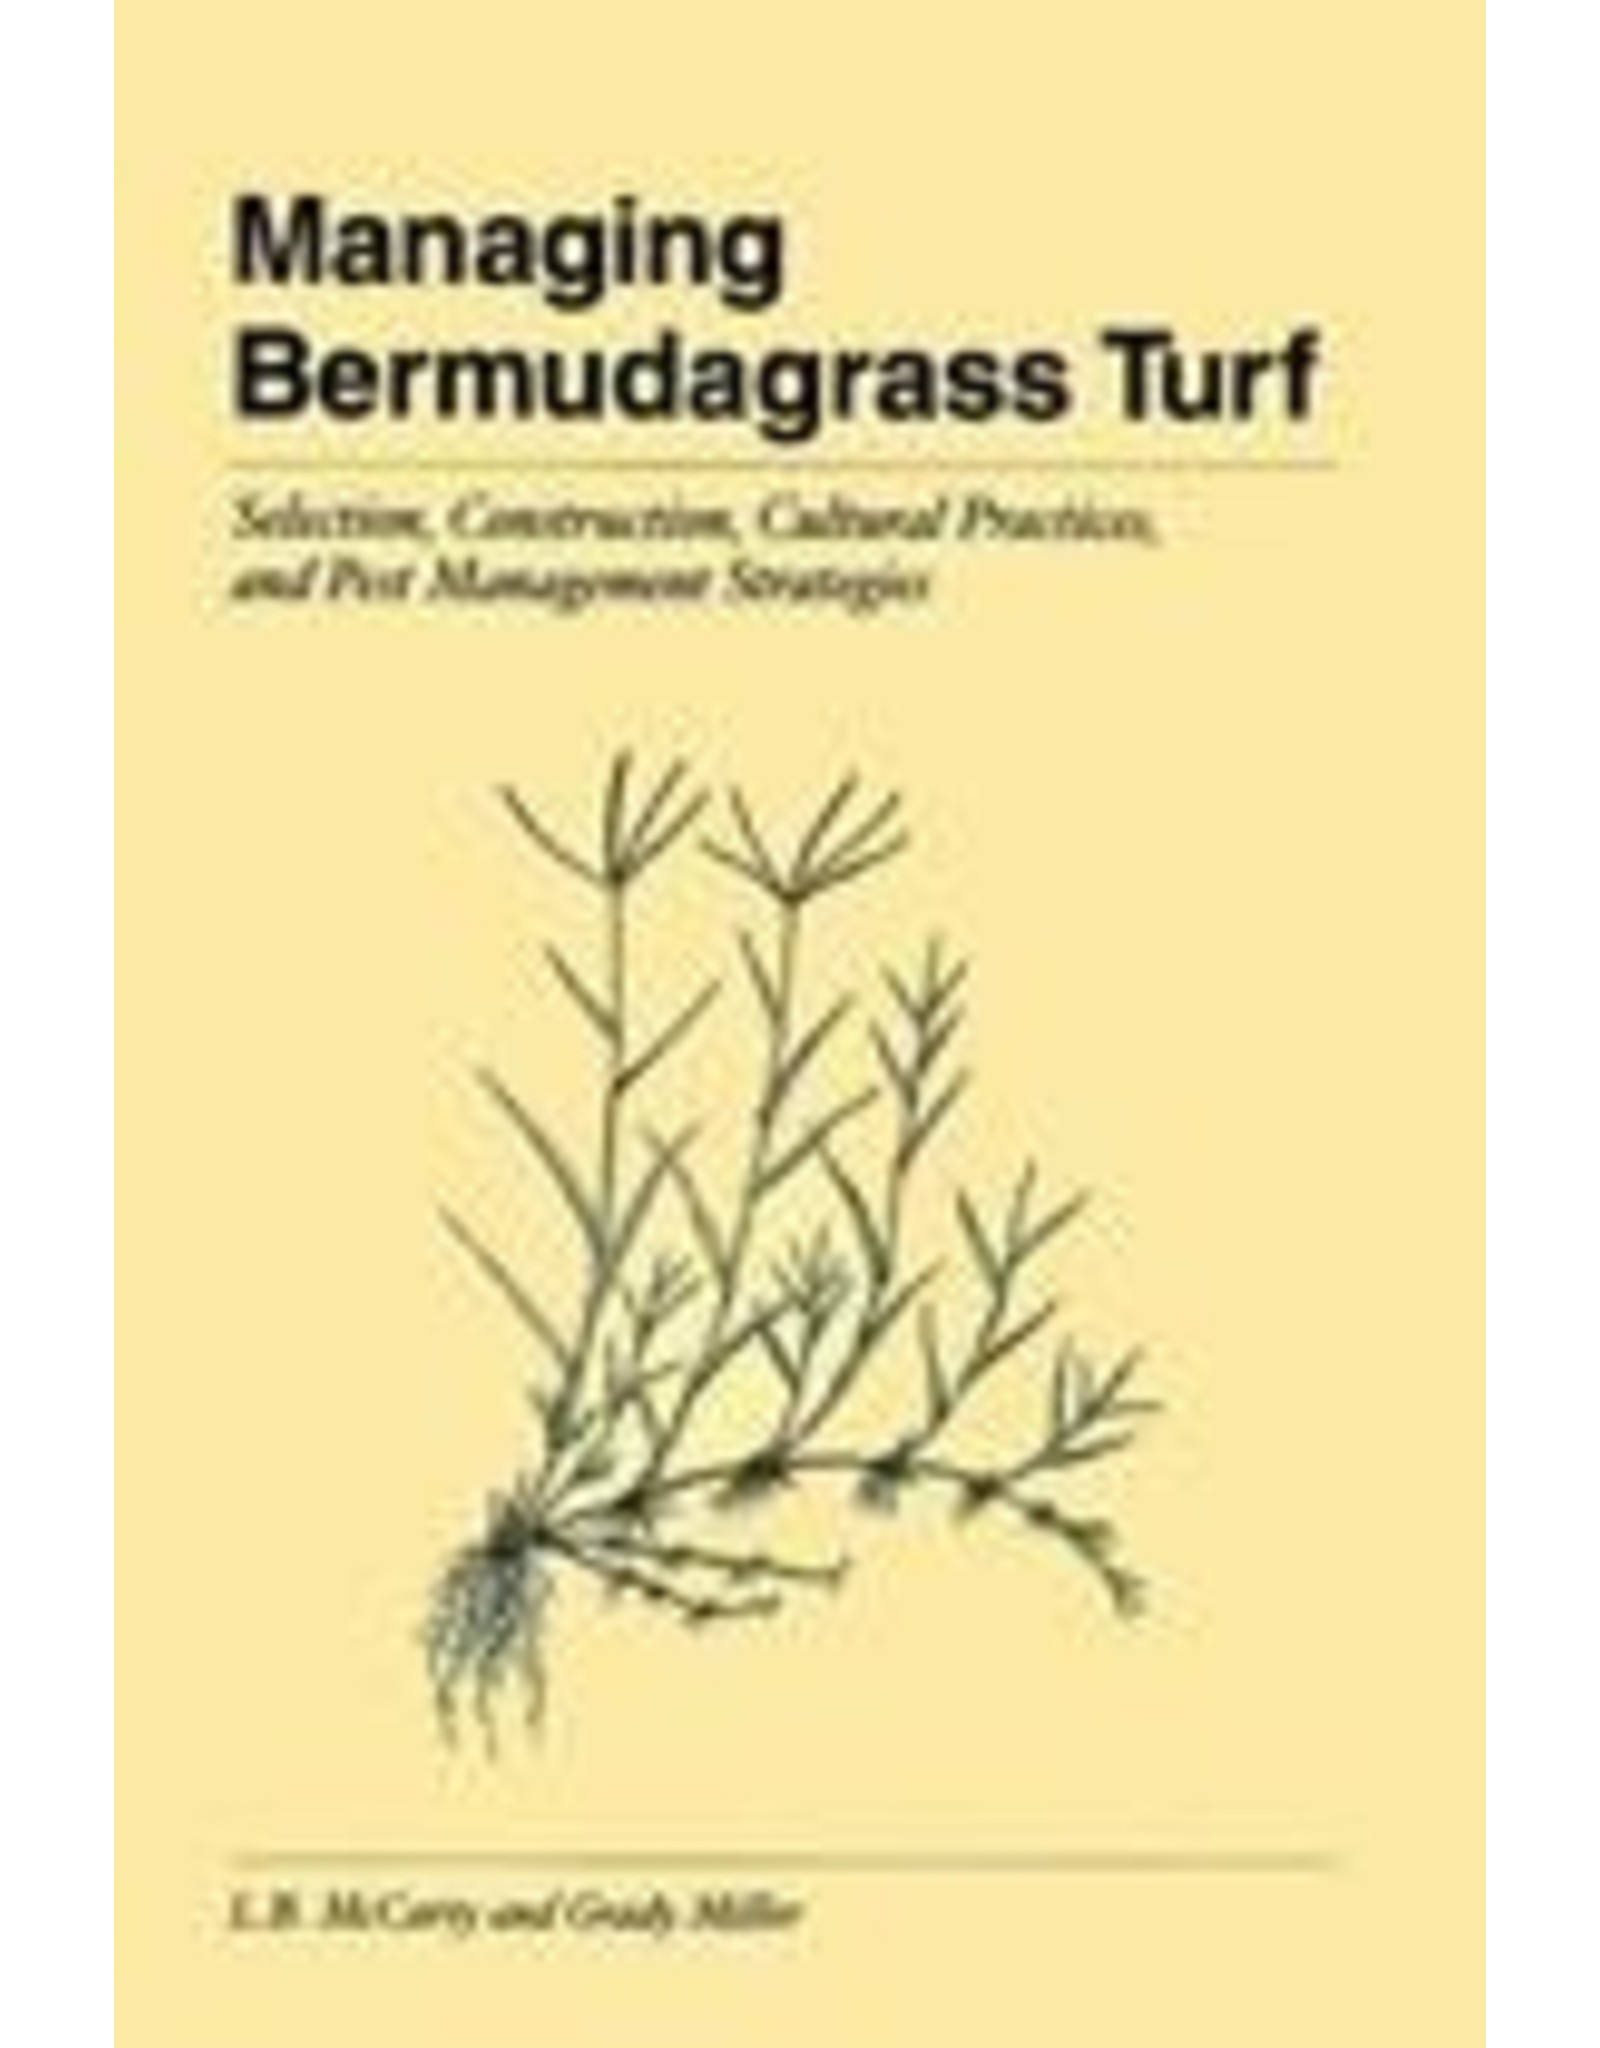 Managing Bermudagrass Turf